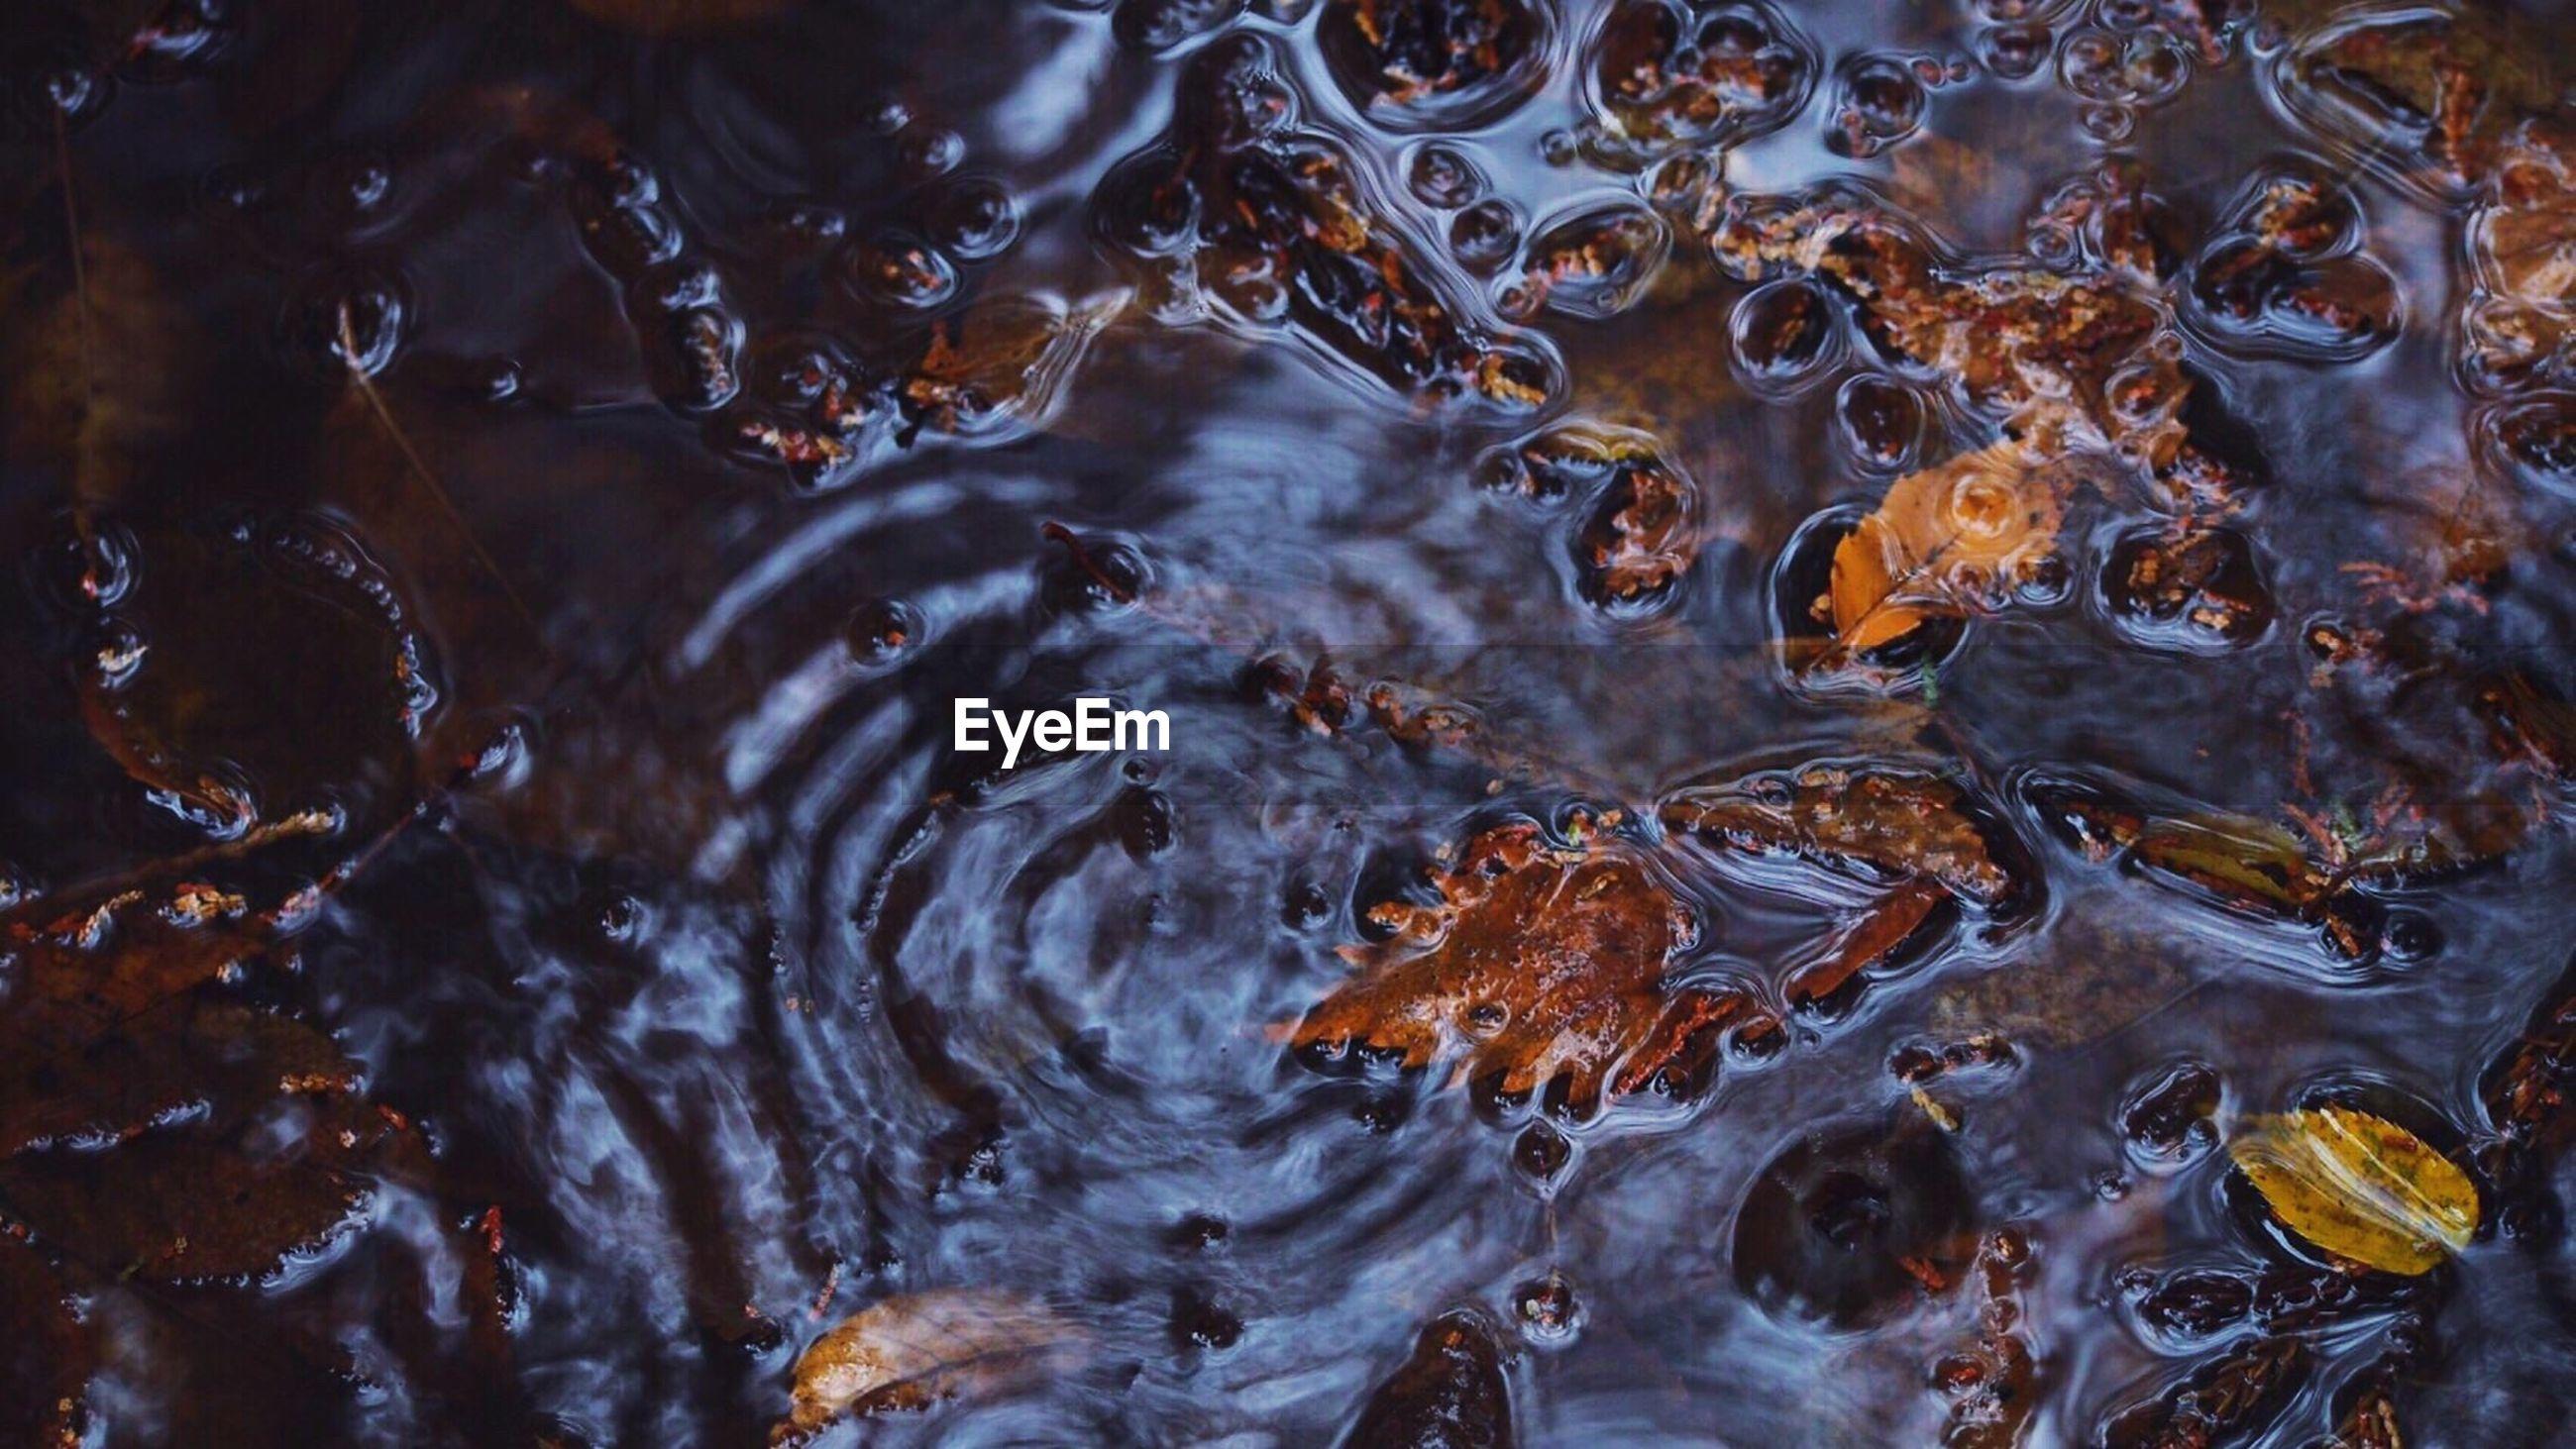 FULL FRAME SHOT OF WATER DROPS